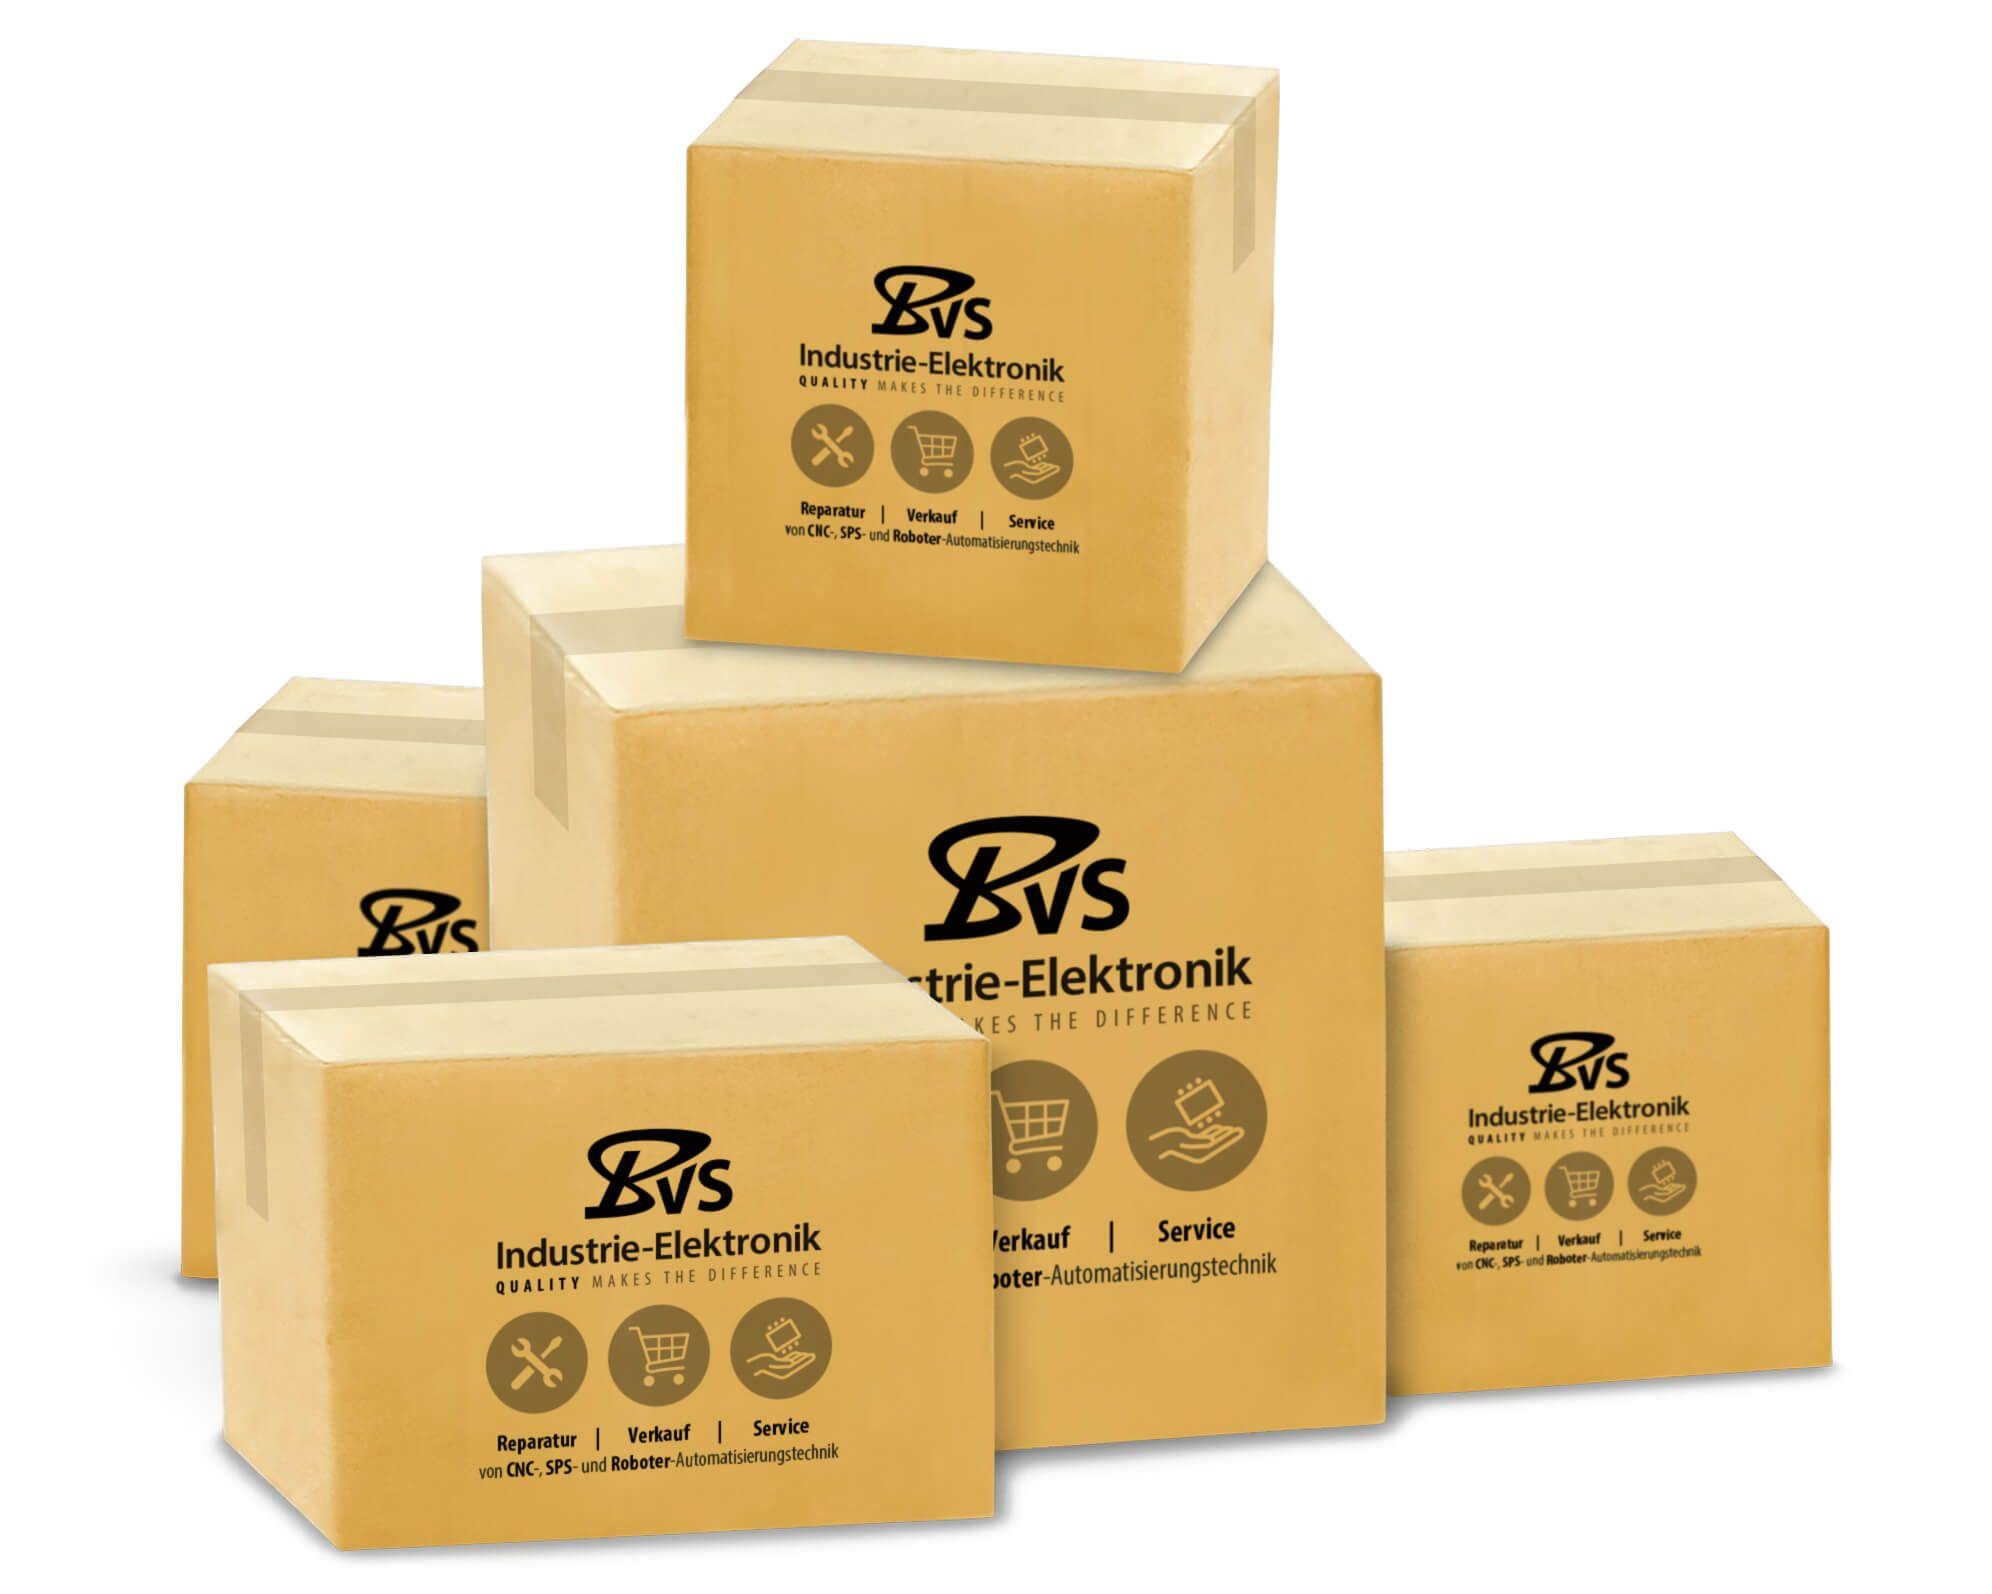 EVS9323-EPV004